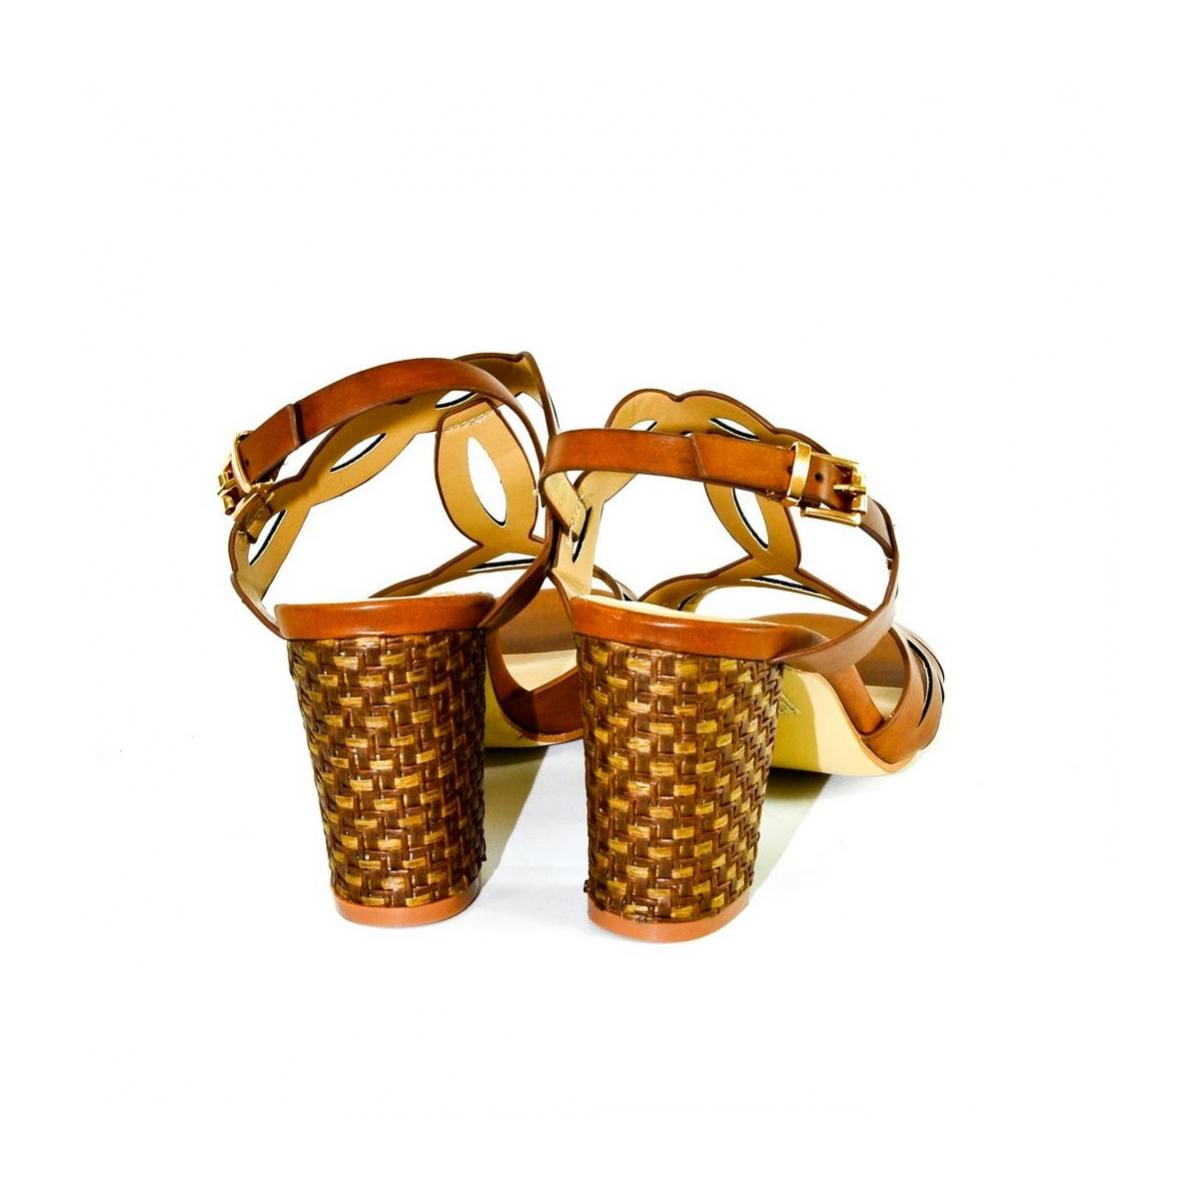 61e049b5bde9a Dámske hnedé sandále THERA - 5